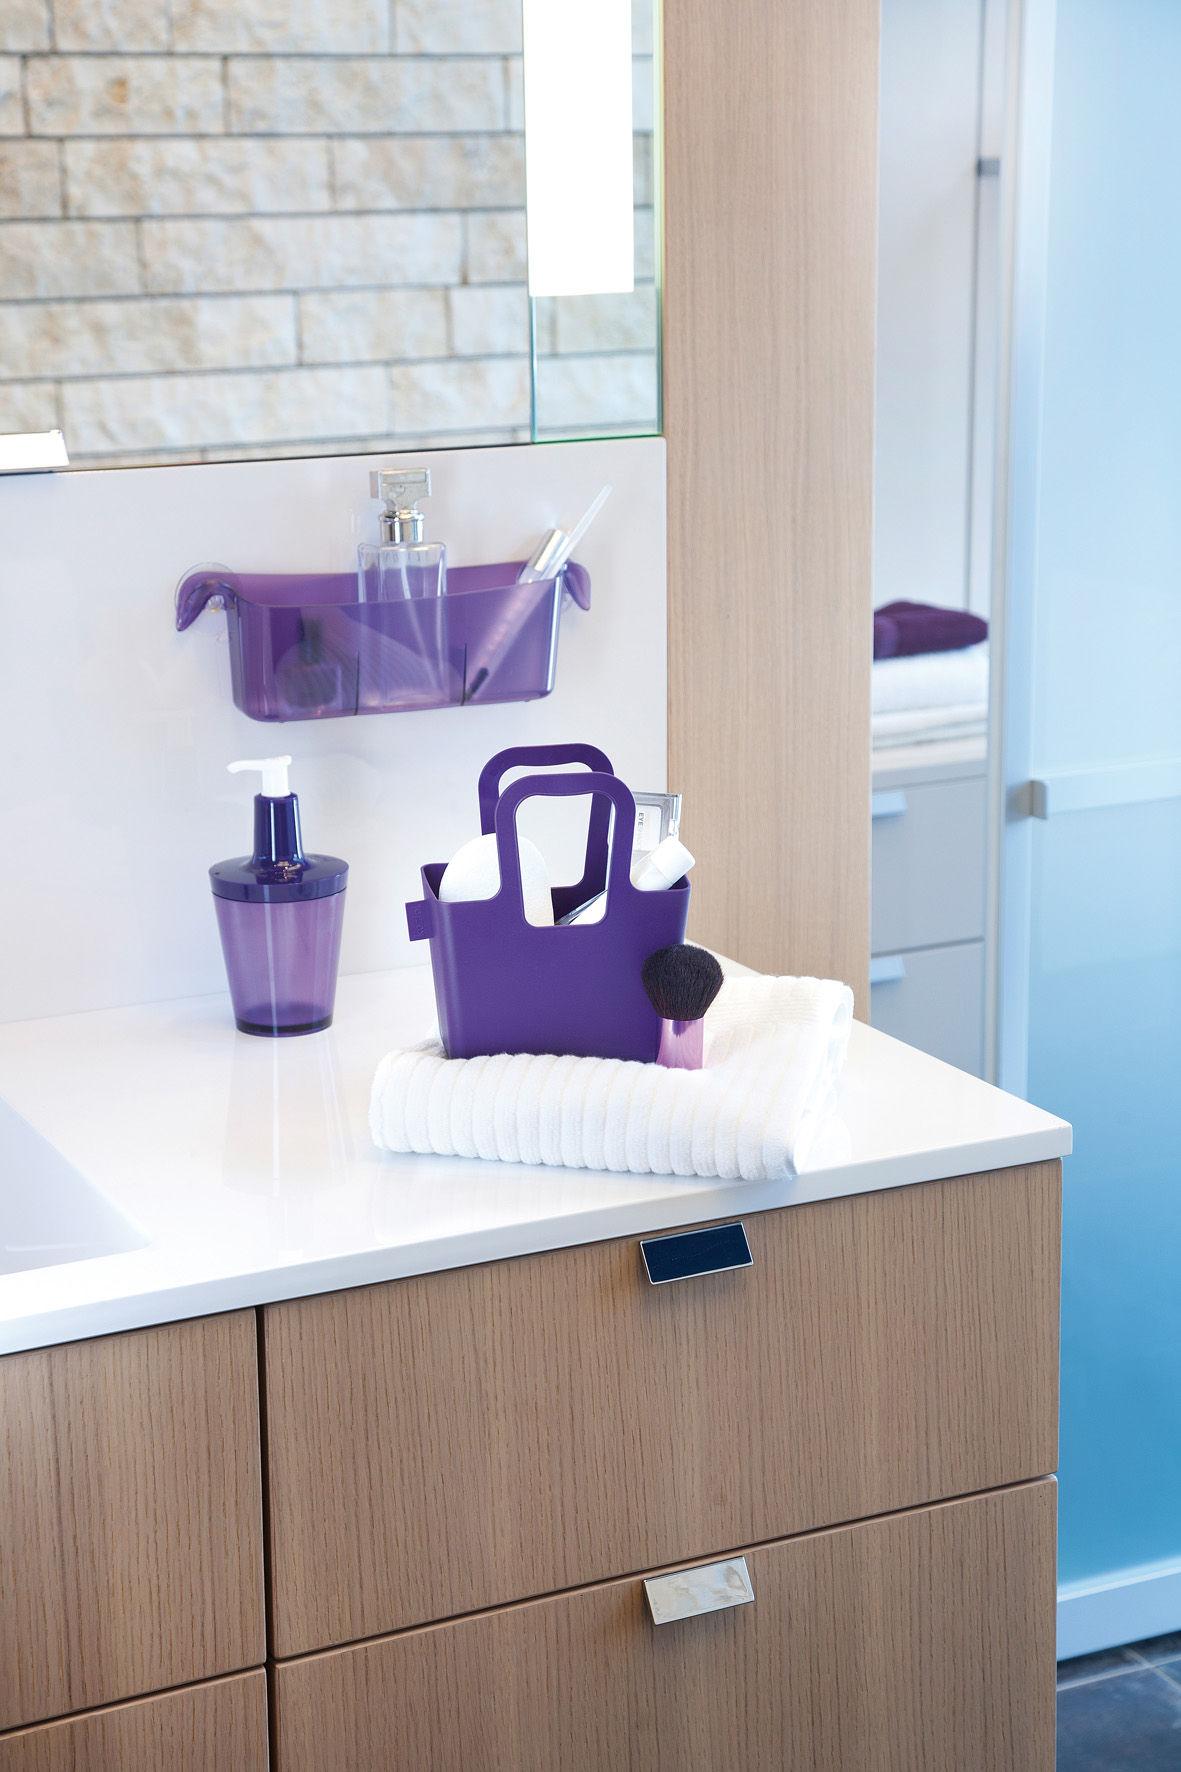 bac de rangement midi boks orange transparent koziol. Black Bedroom Furniture Sets. Home Design Ideas